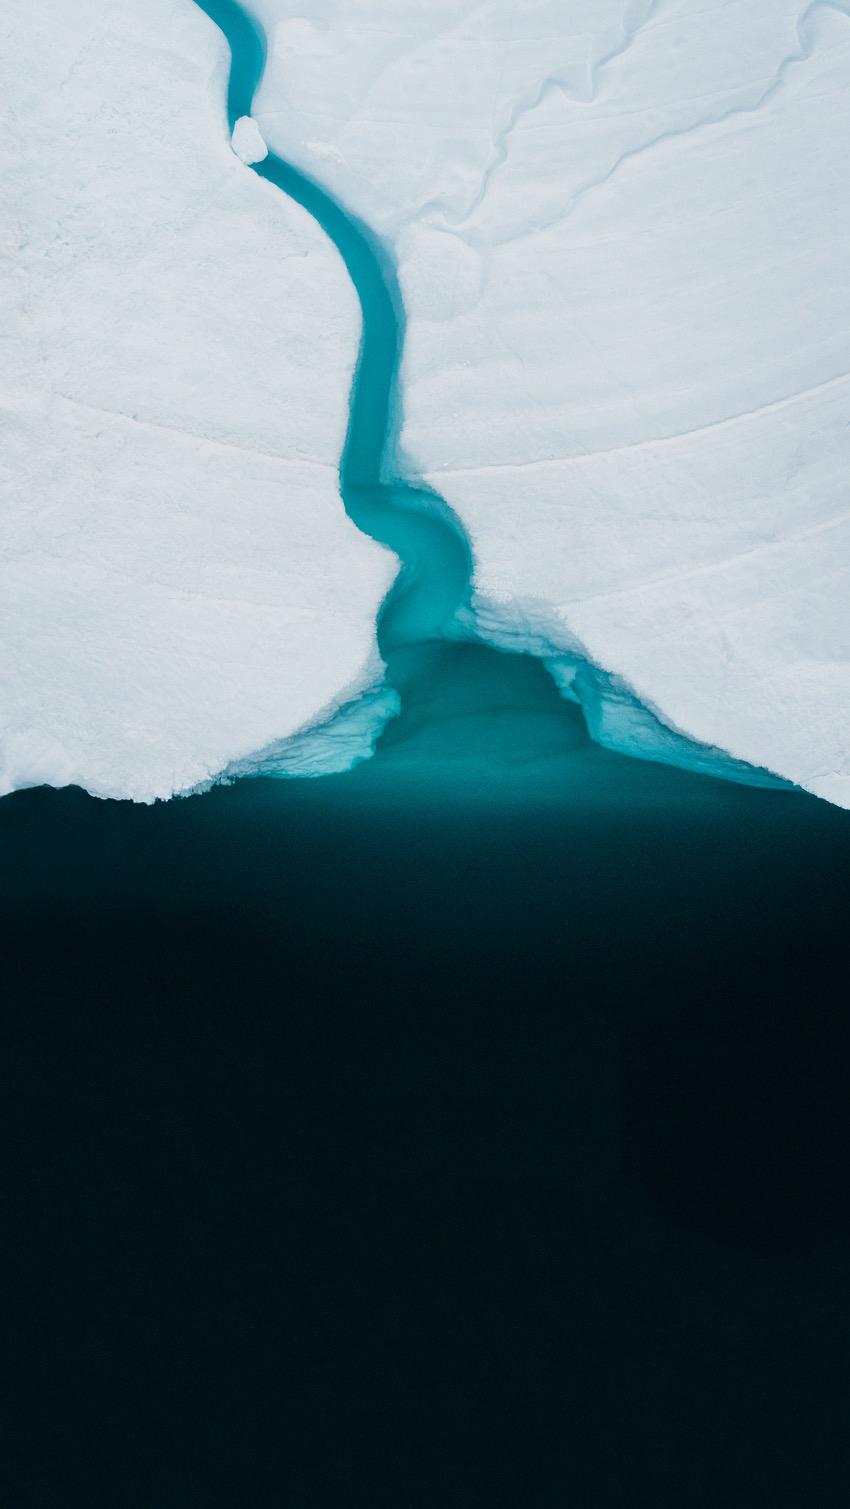 The Iceberg Series - 德国摄影师 Tom Hegen 作品:冰山